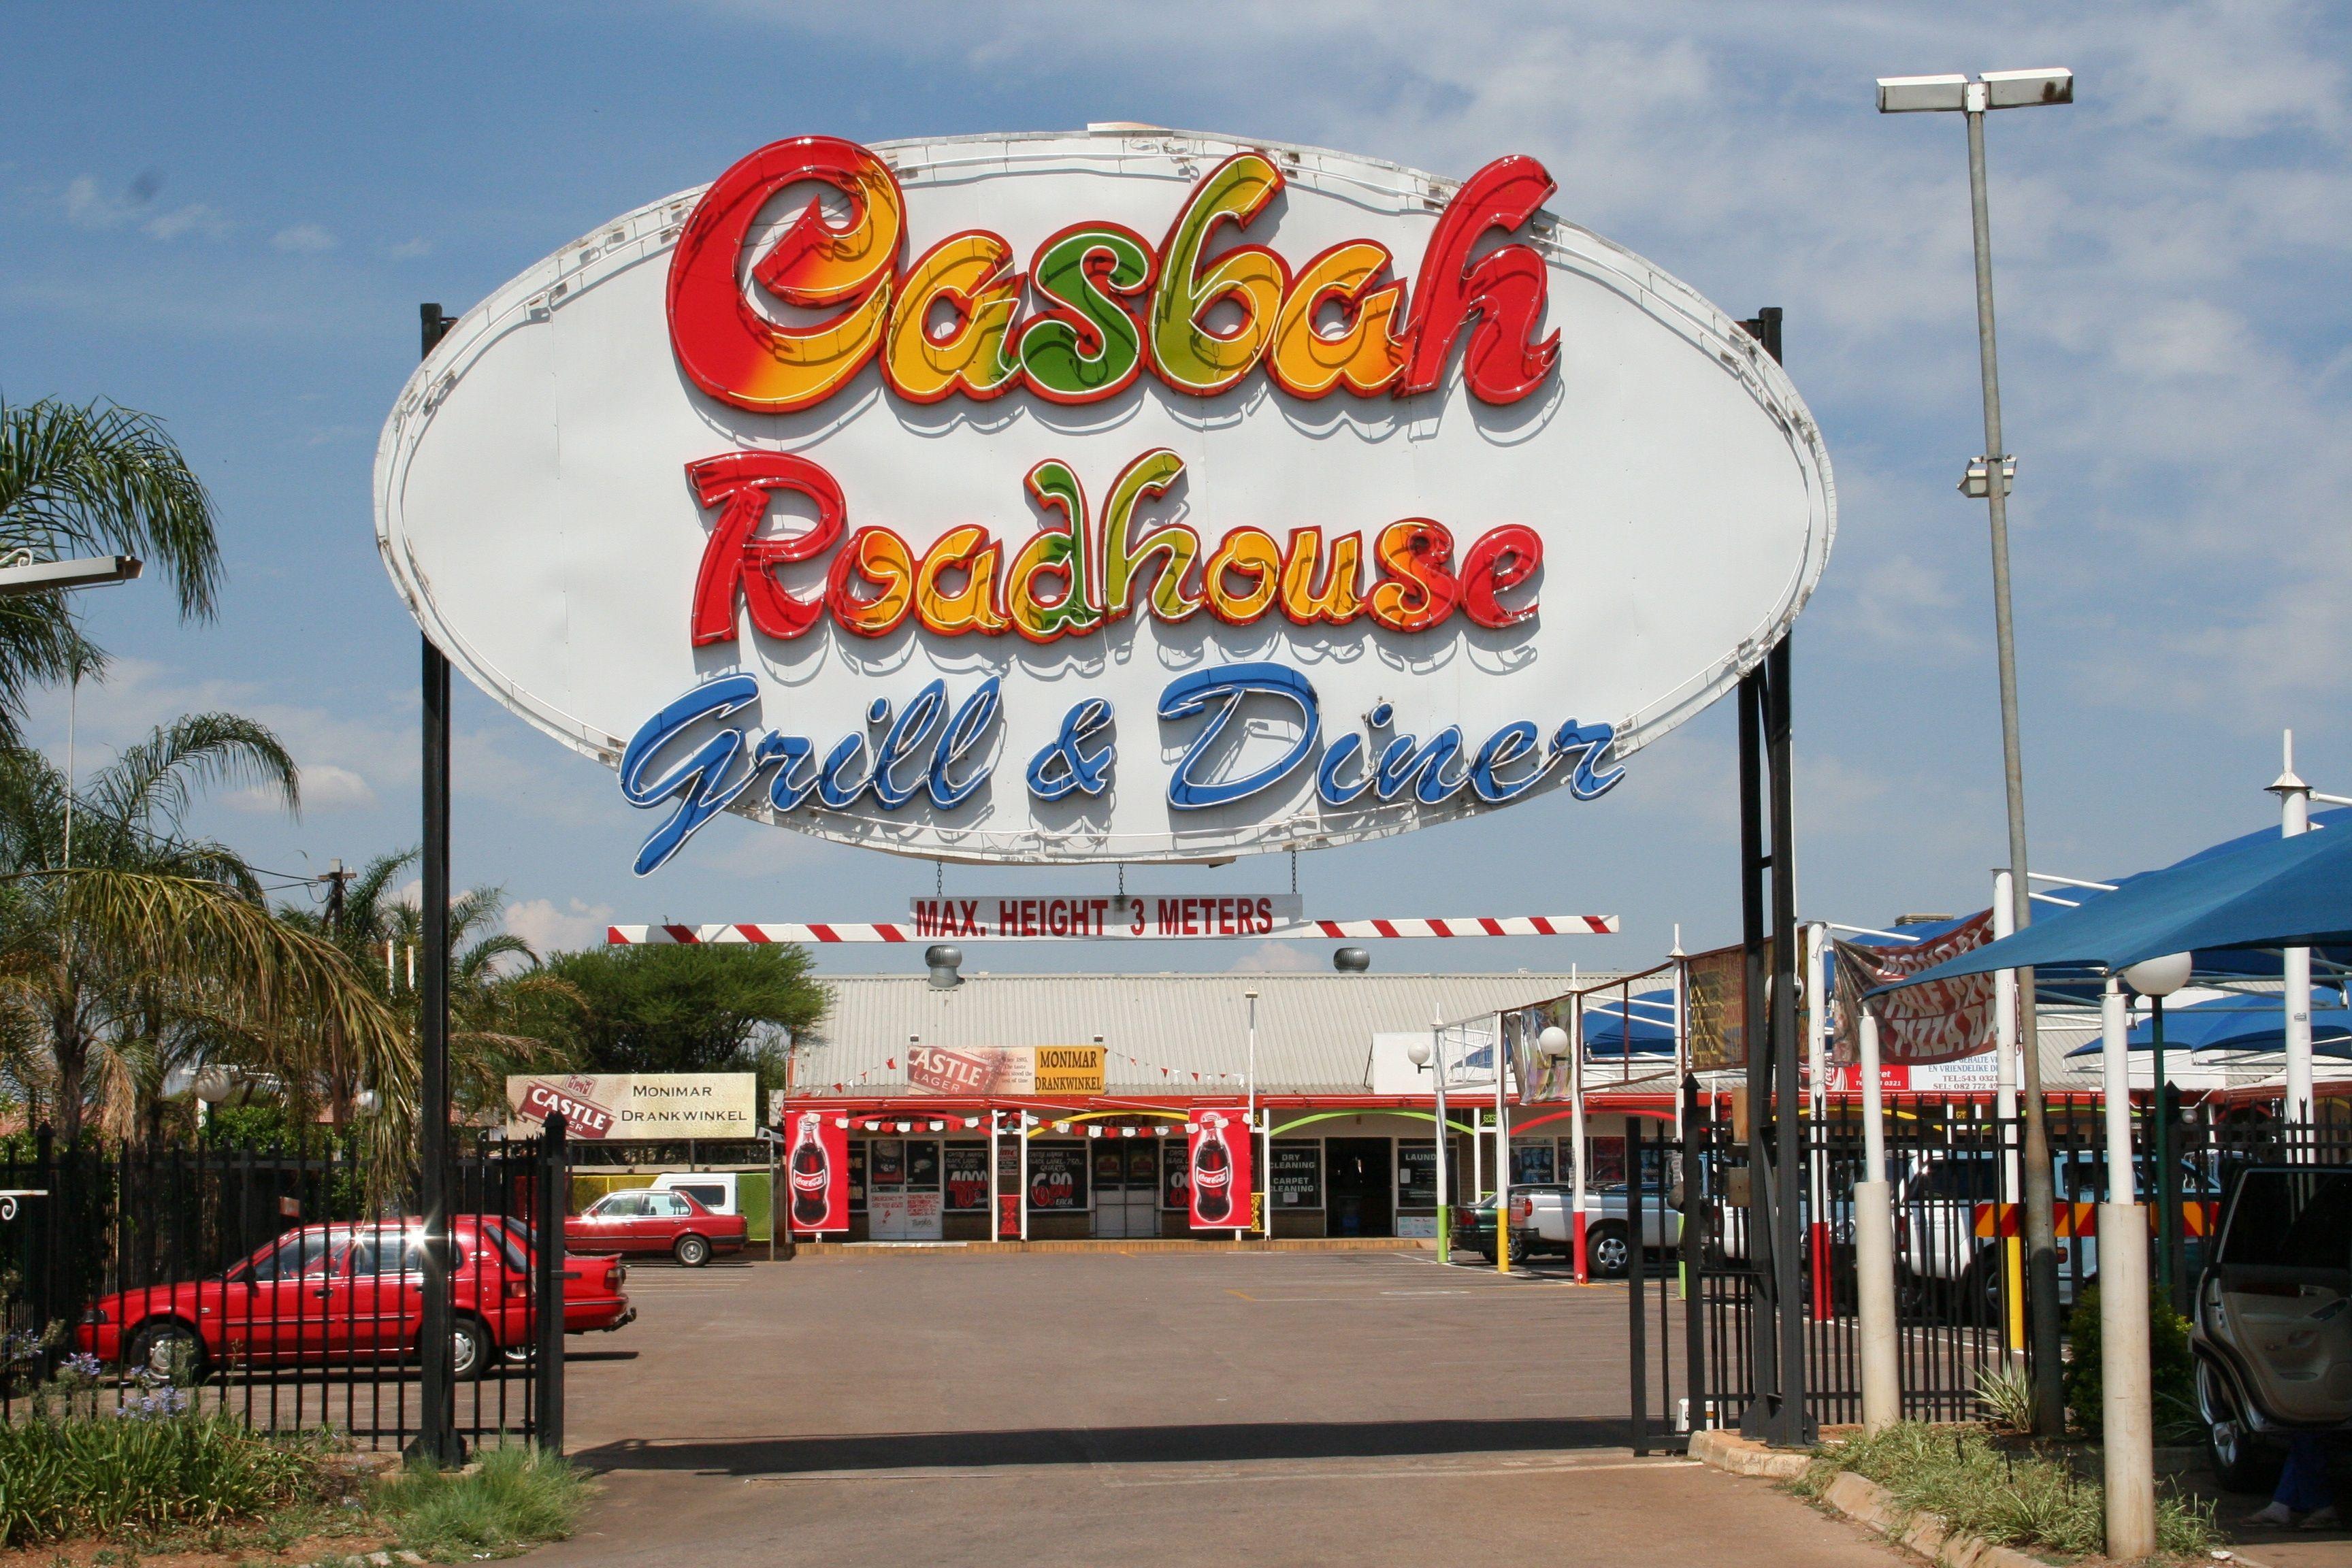 Casbah Roadhouse (Annlin Branch) Neon signs, Neon, Branch